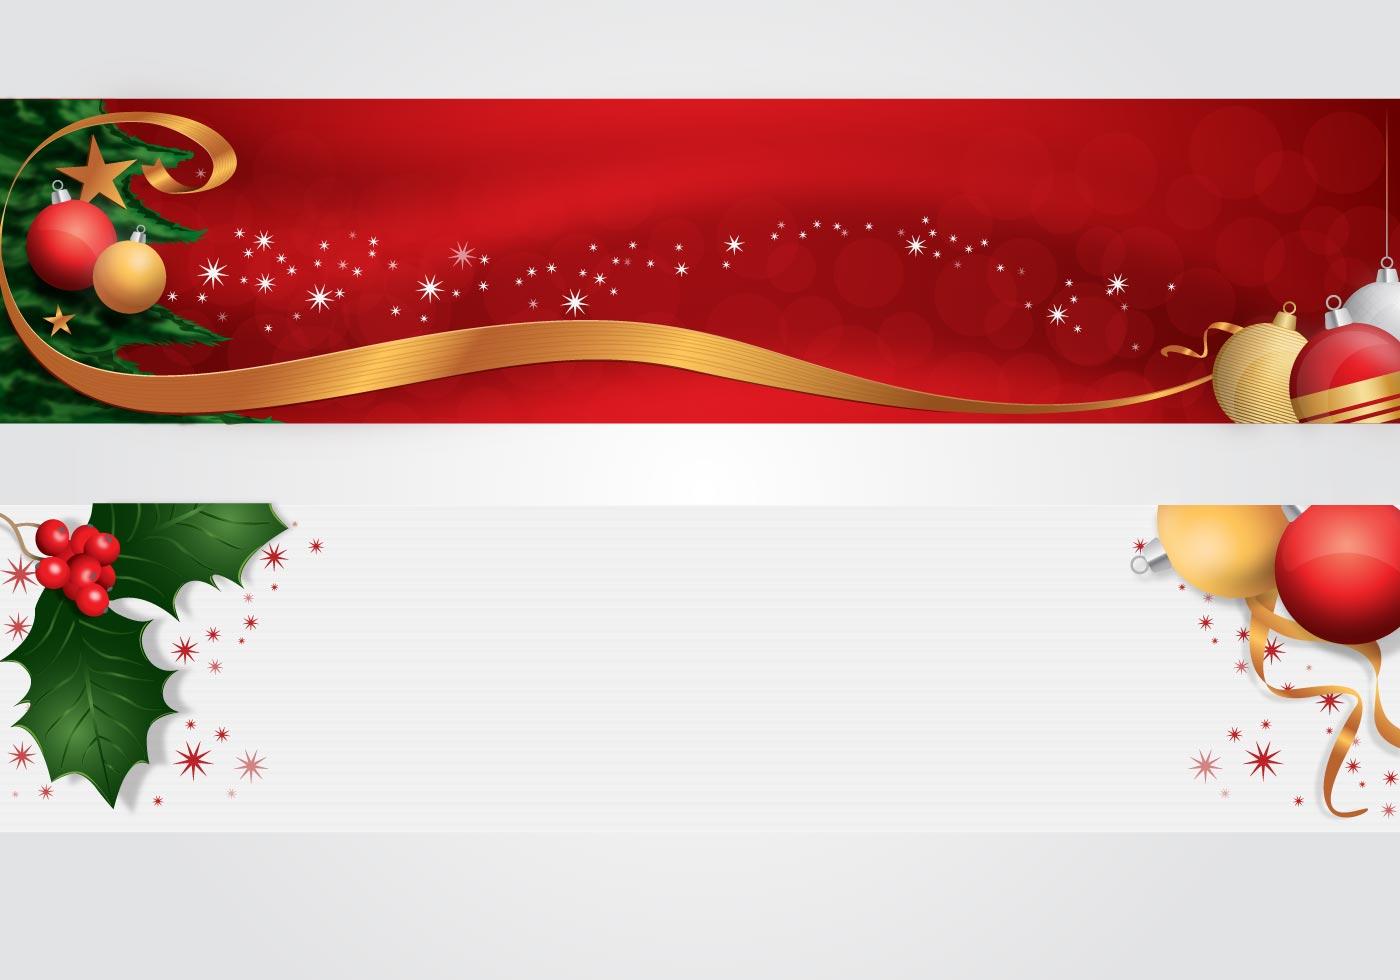 Christmas Headers - Download Free Vector Art, Stock ...